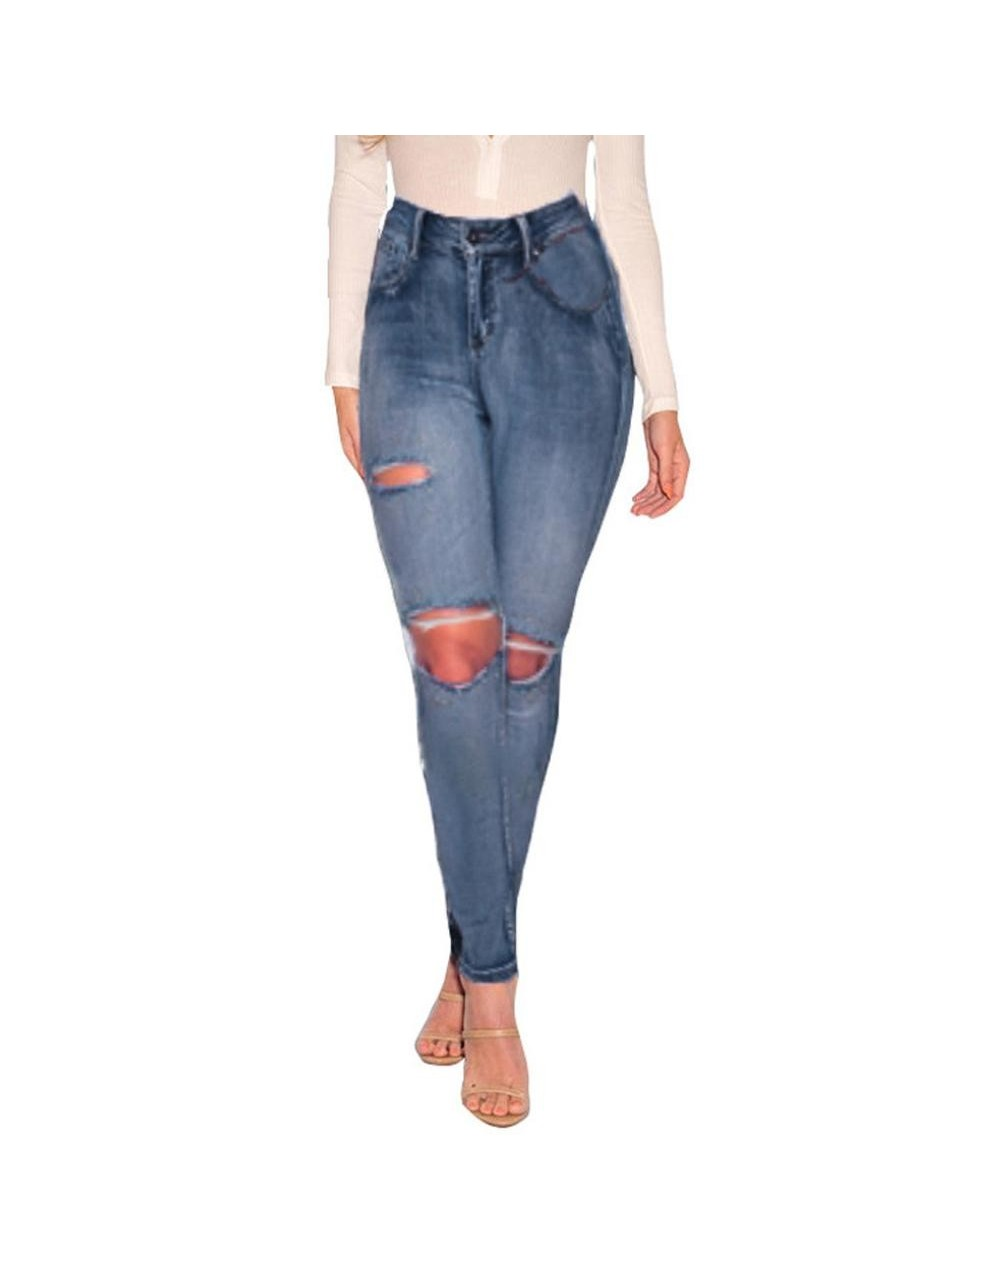 Jeans Women Denim Pants High Waist Long Pants Pocket Denim Slim Sexy Jeans Hole Stretch Length Jeans Vaqueros Mujer 4B07 - B...